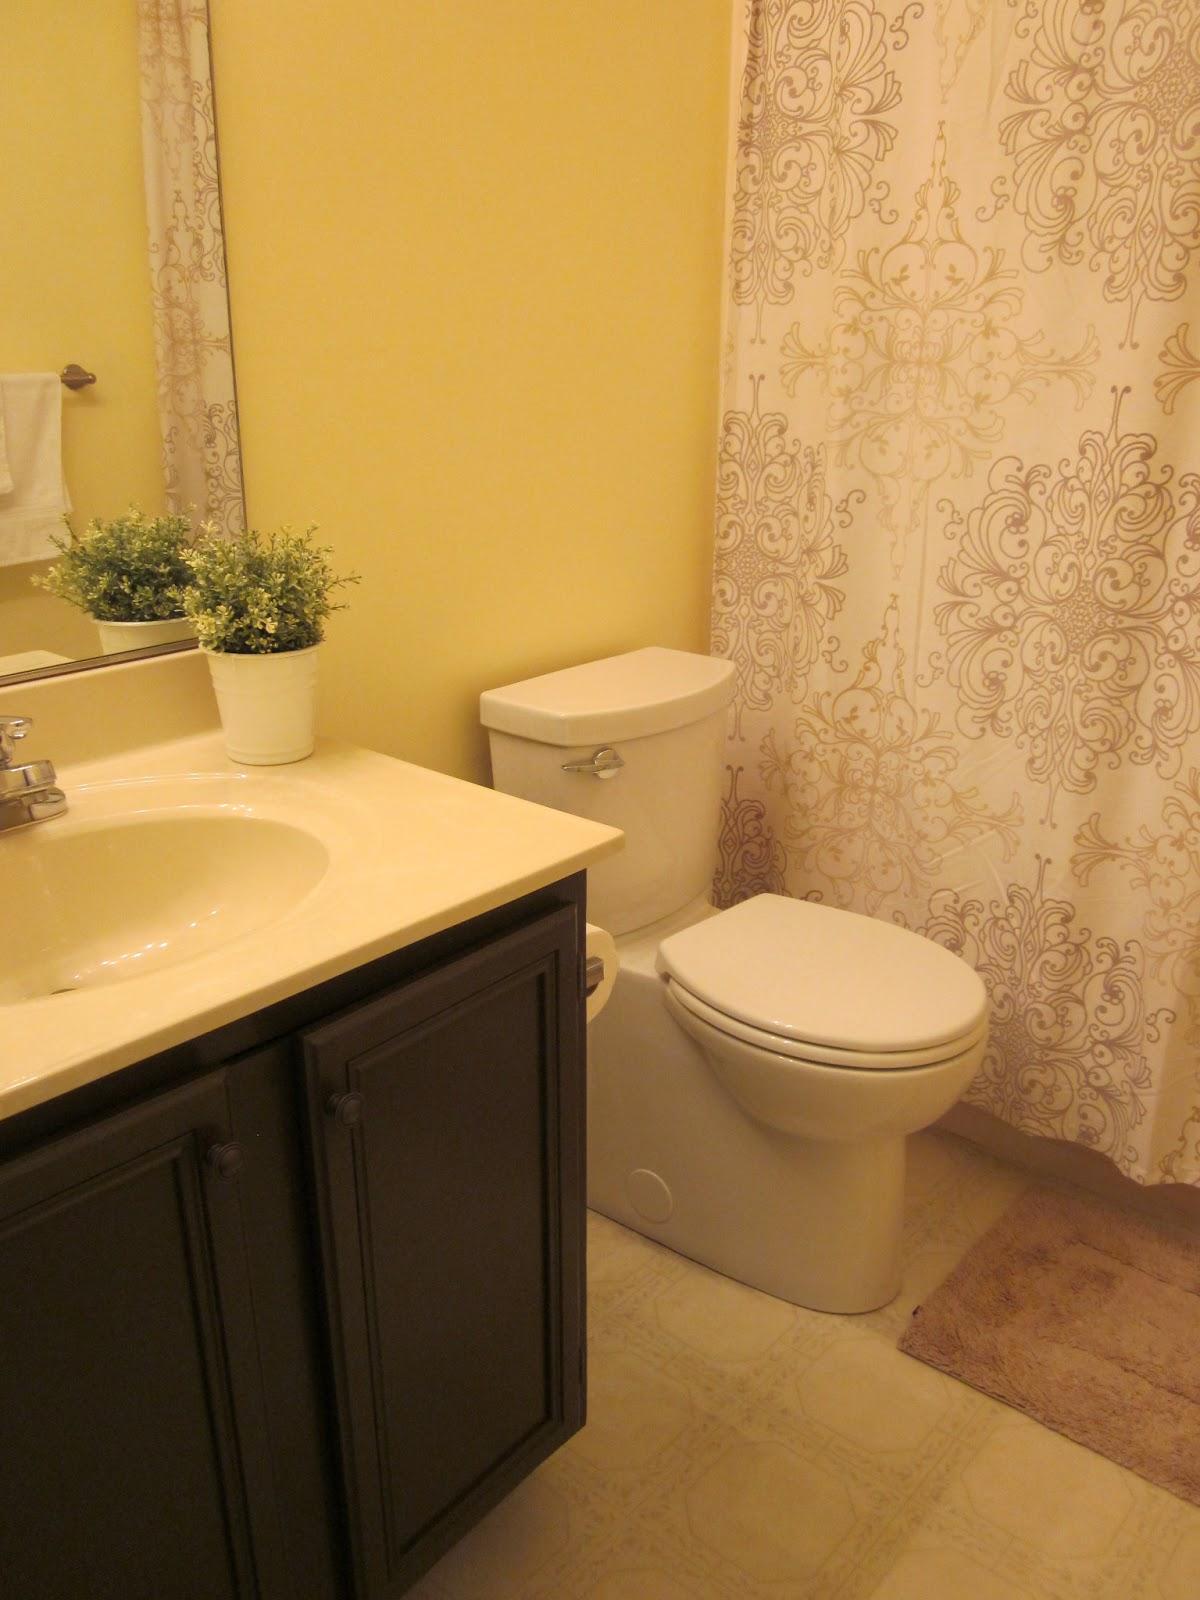 Bathroom Vanities You Put Together coffee, caramel & cream: how to paint your bathroom vanity